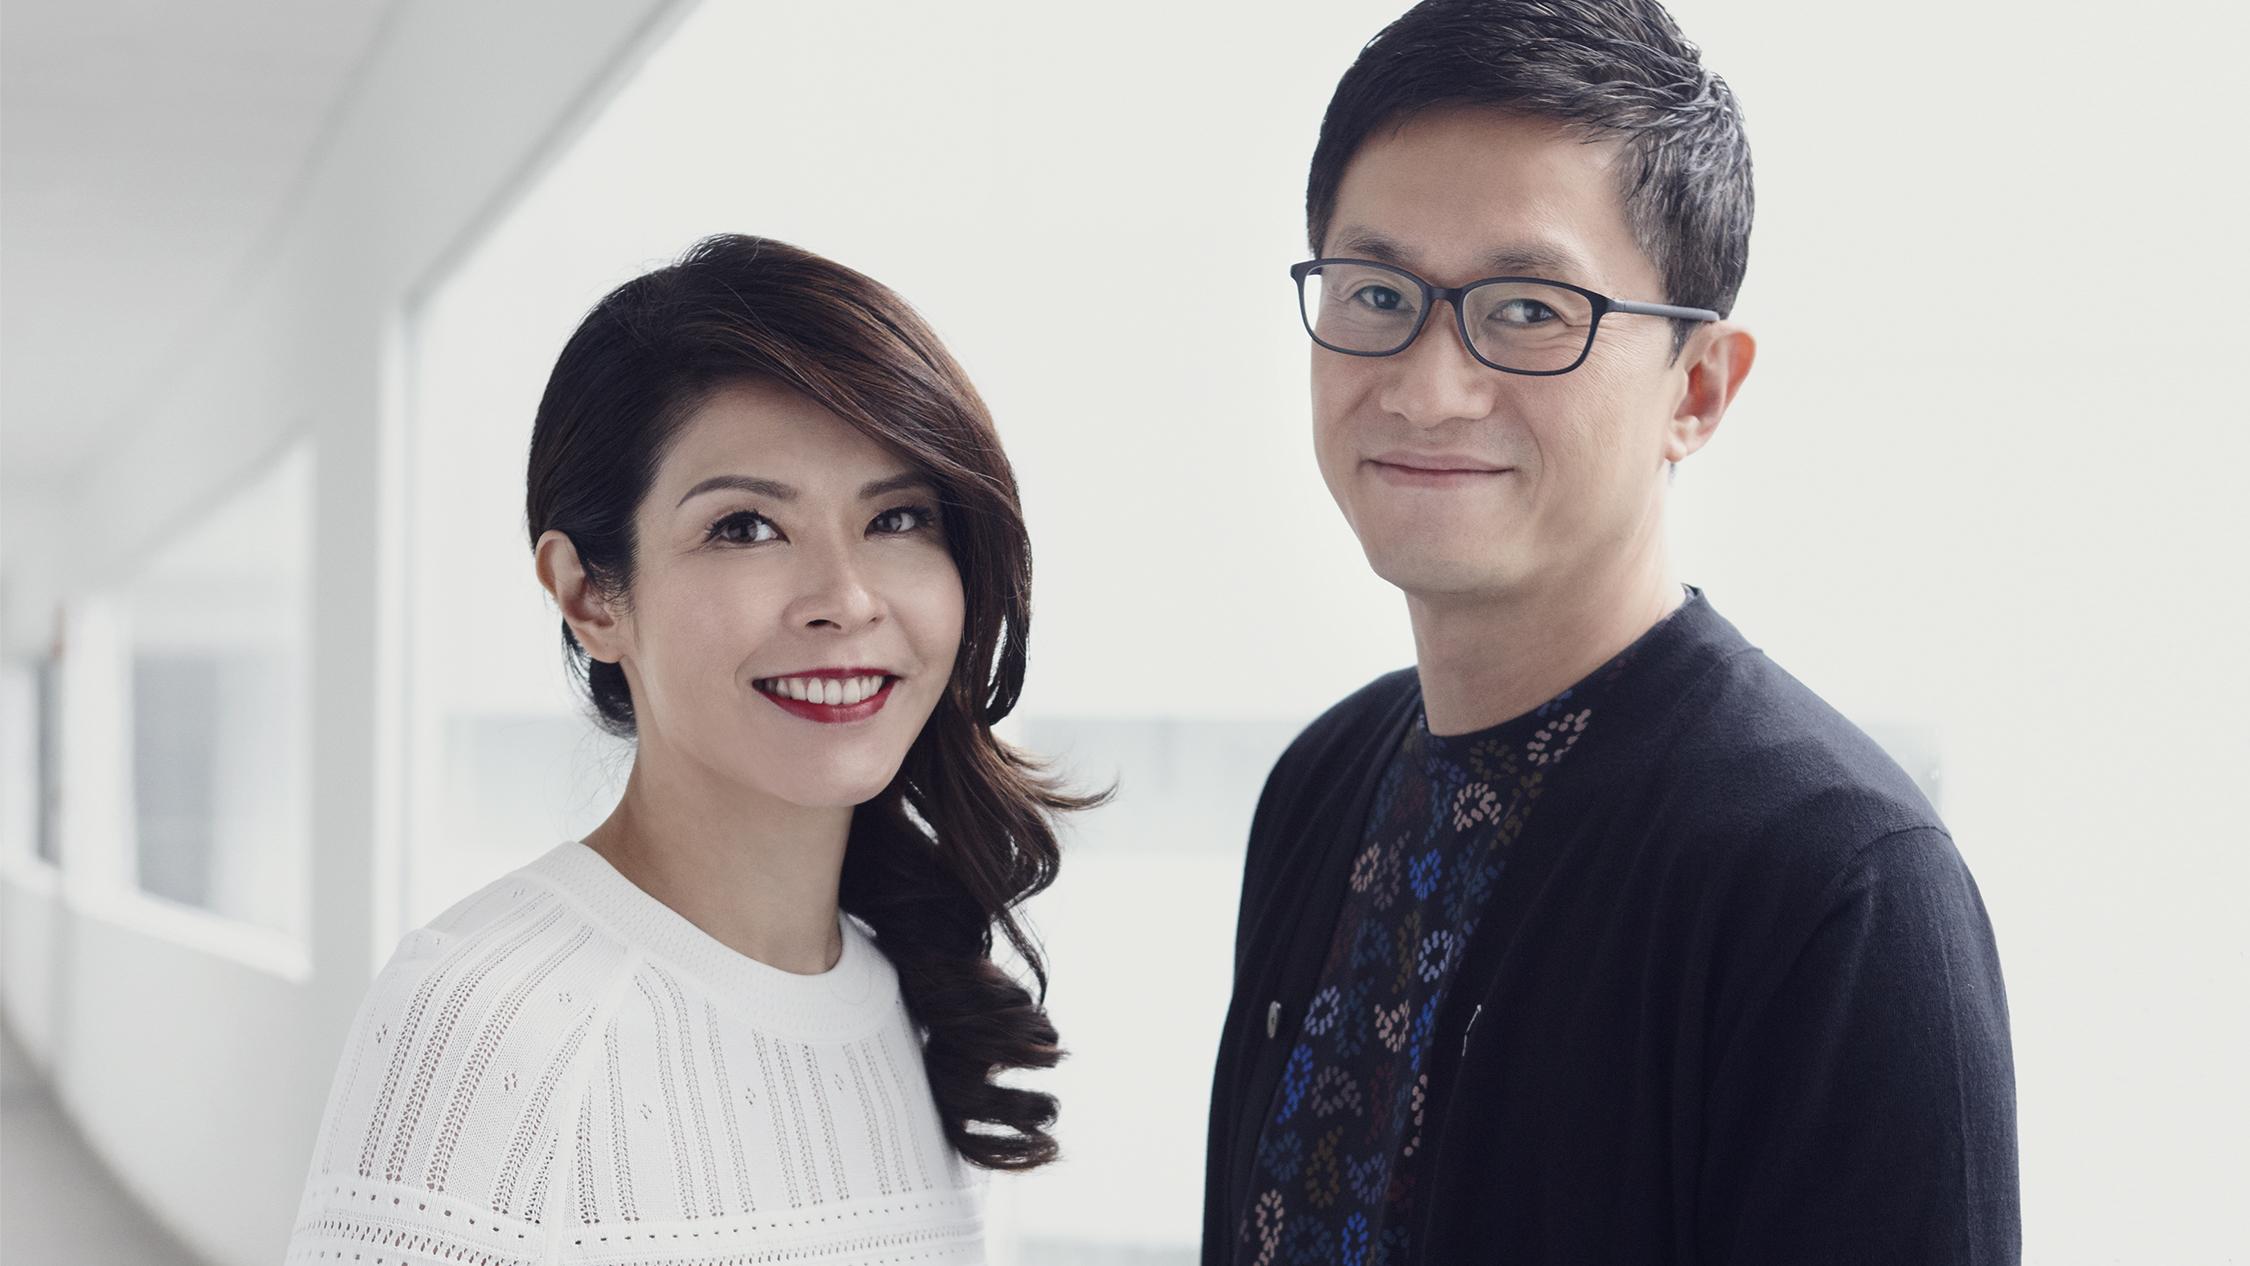 James Quan and Winnie Chen